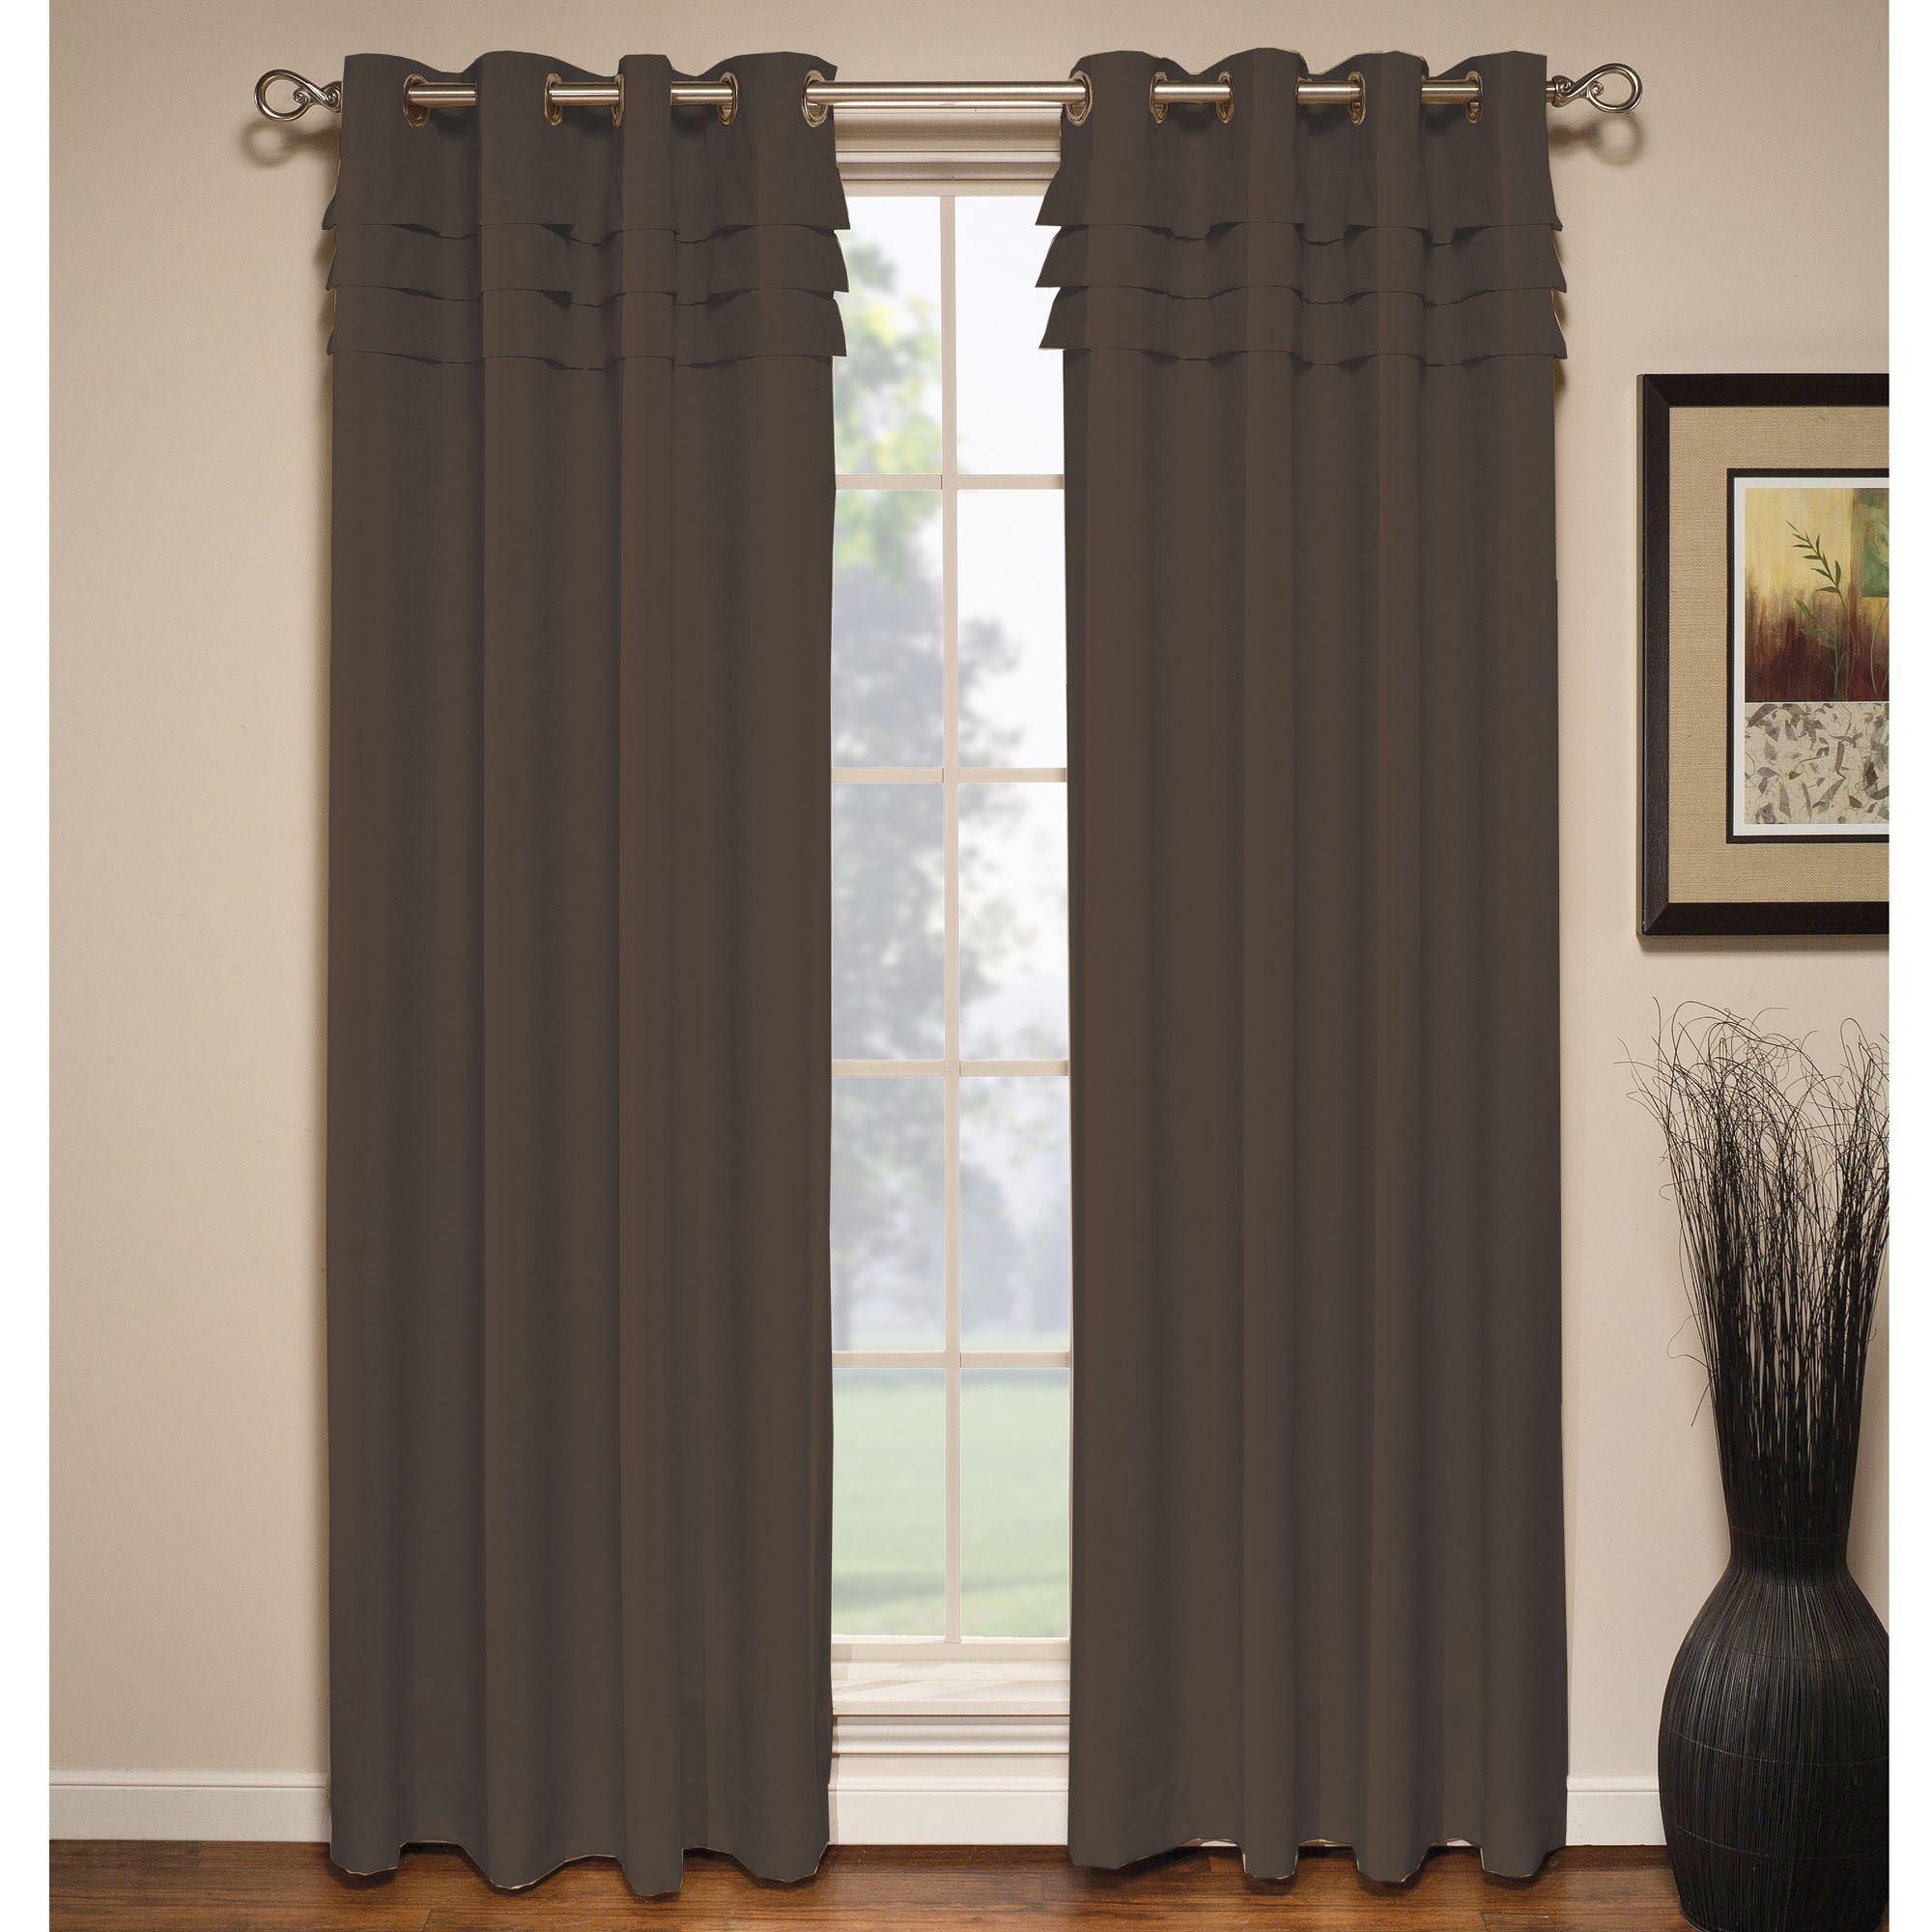 curtain design sets full inspirational x size ladybug denim curtains measurements best in shower of drapes